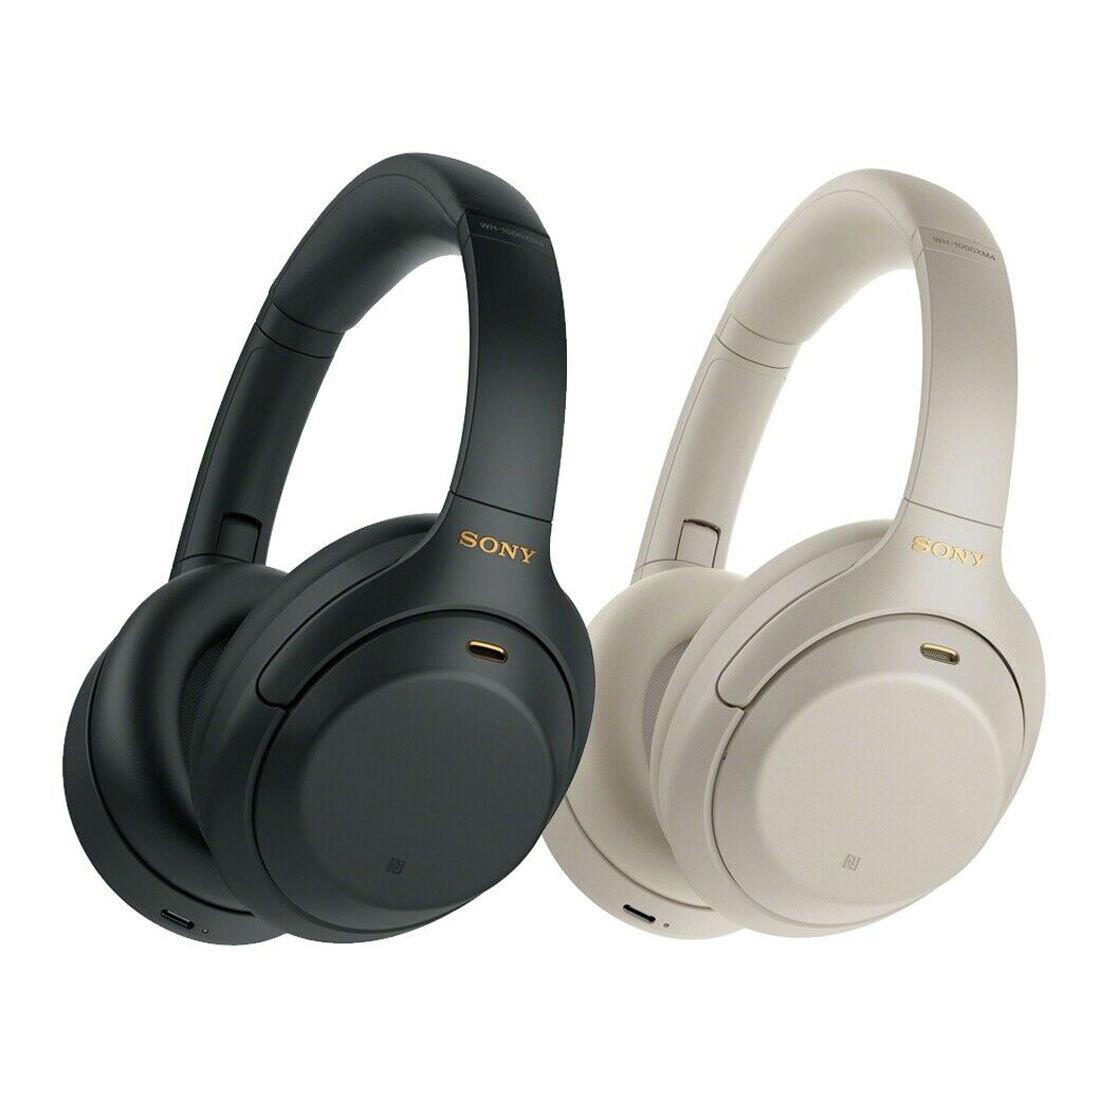 Sony Noise-Cancelling Headphones in Kenya